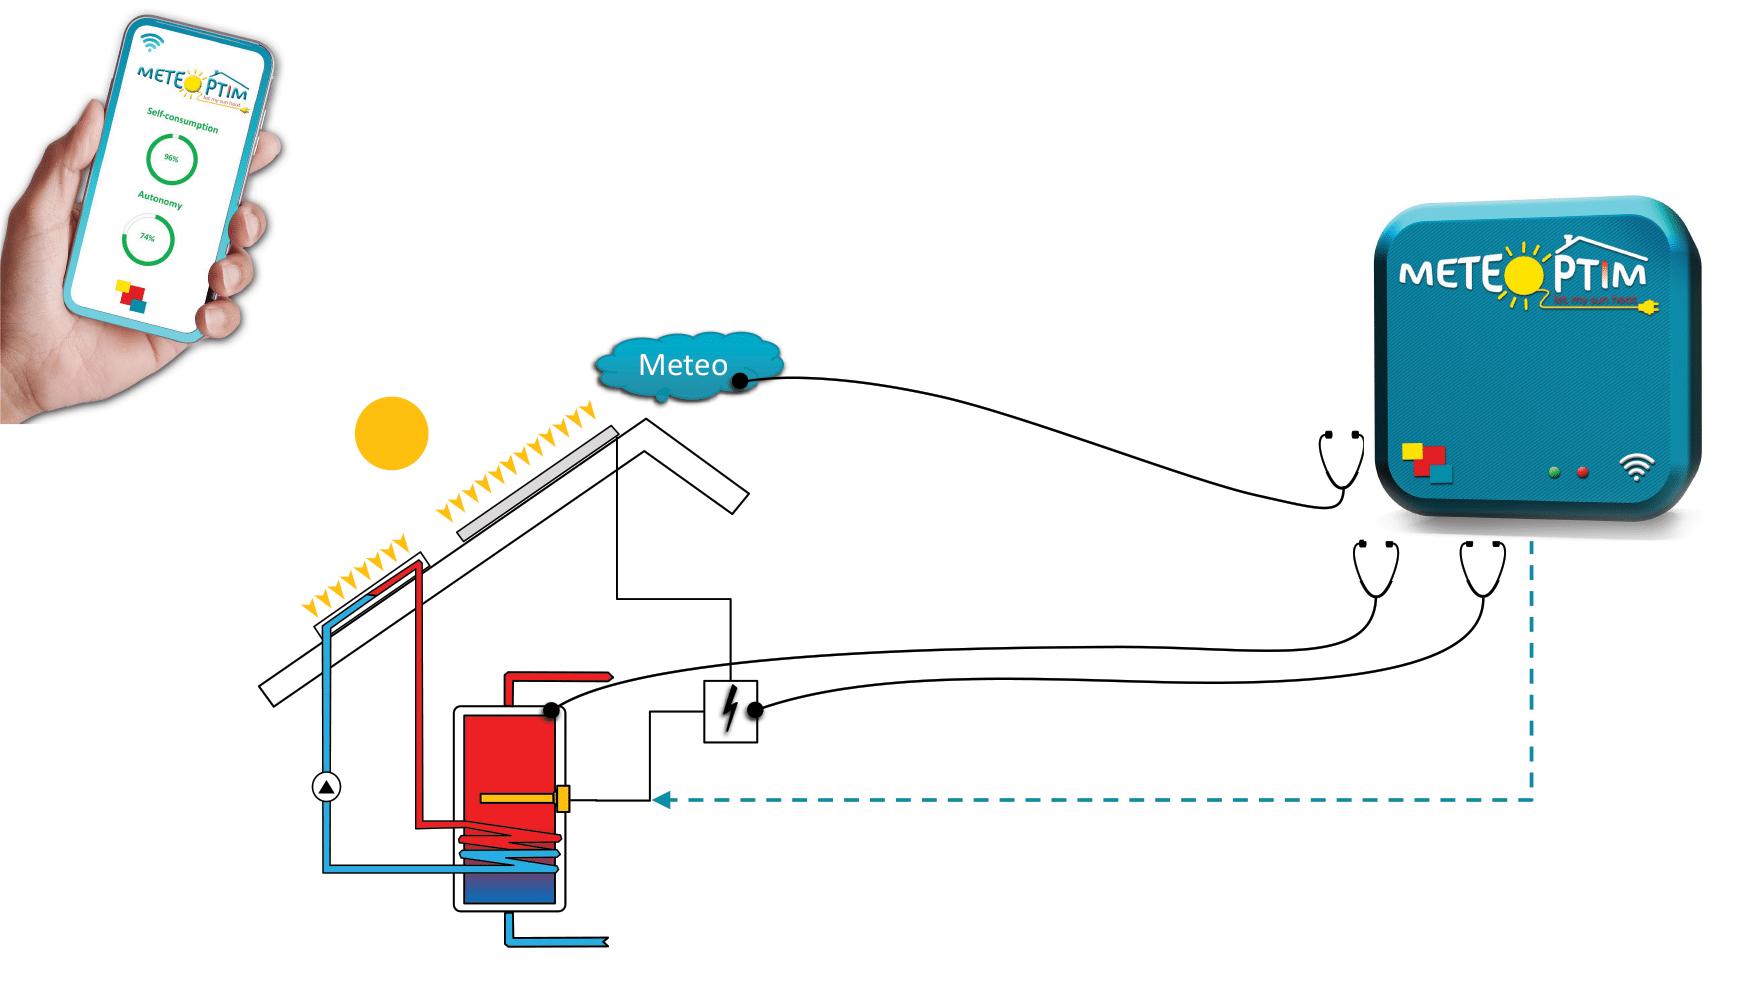 BOX METEOPTIM